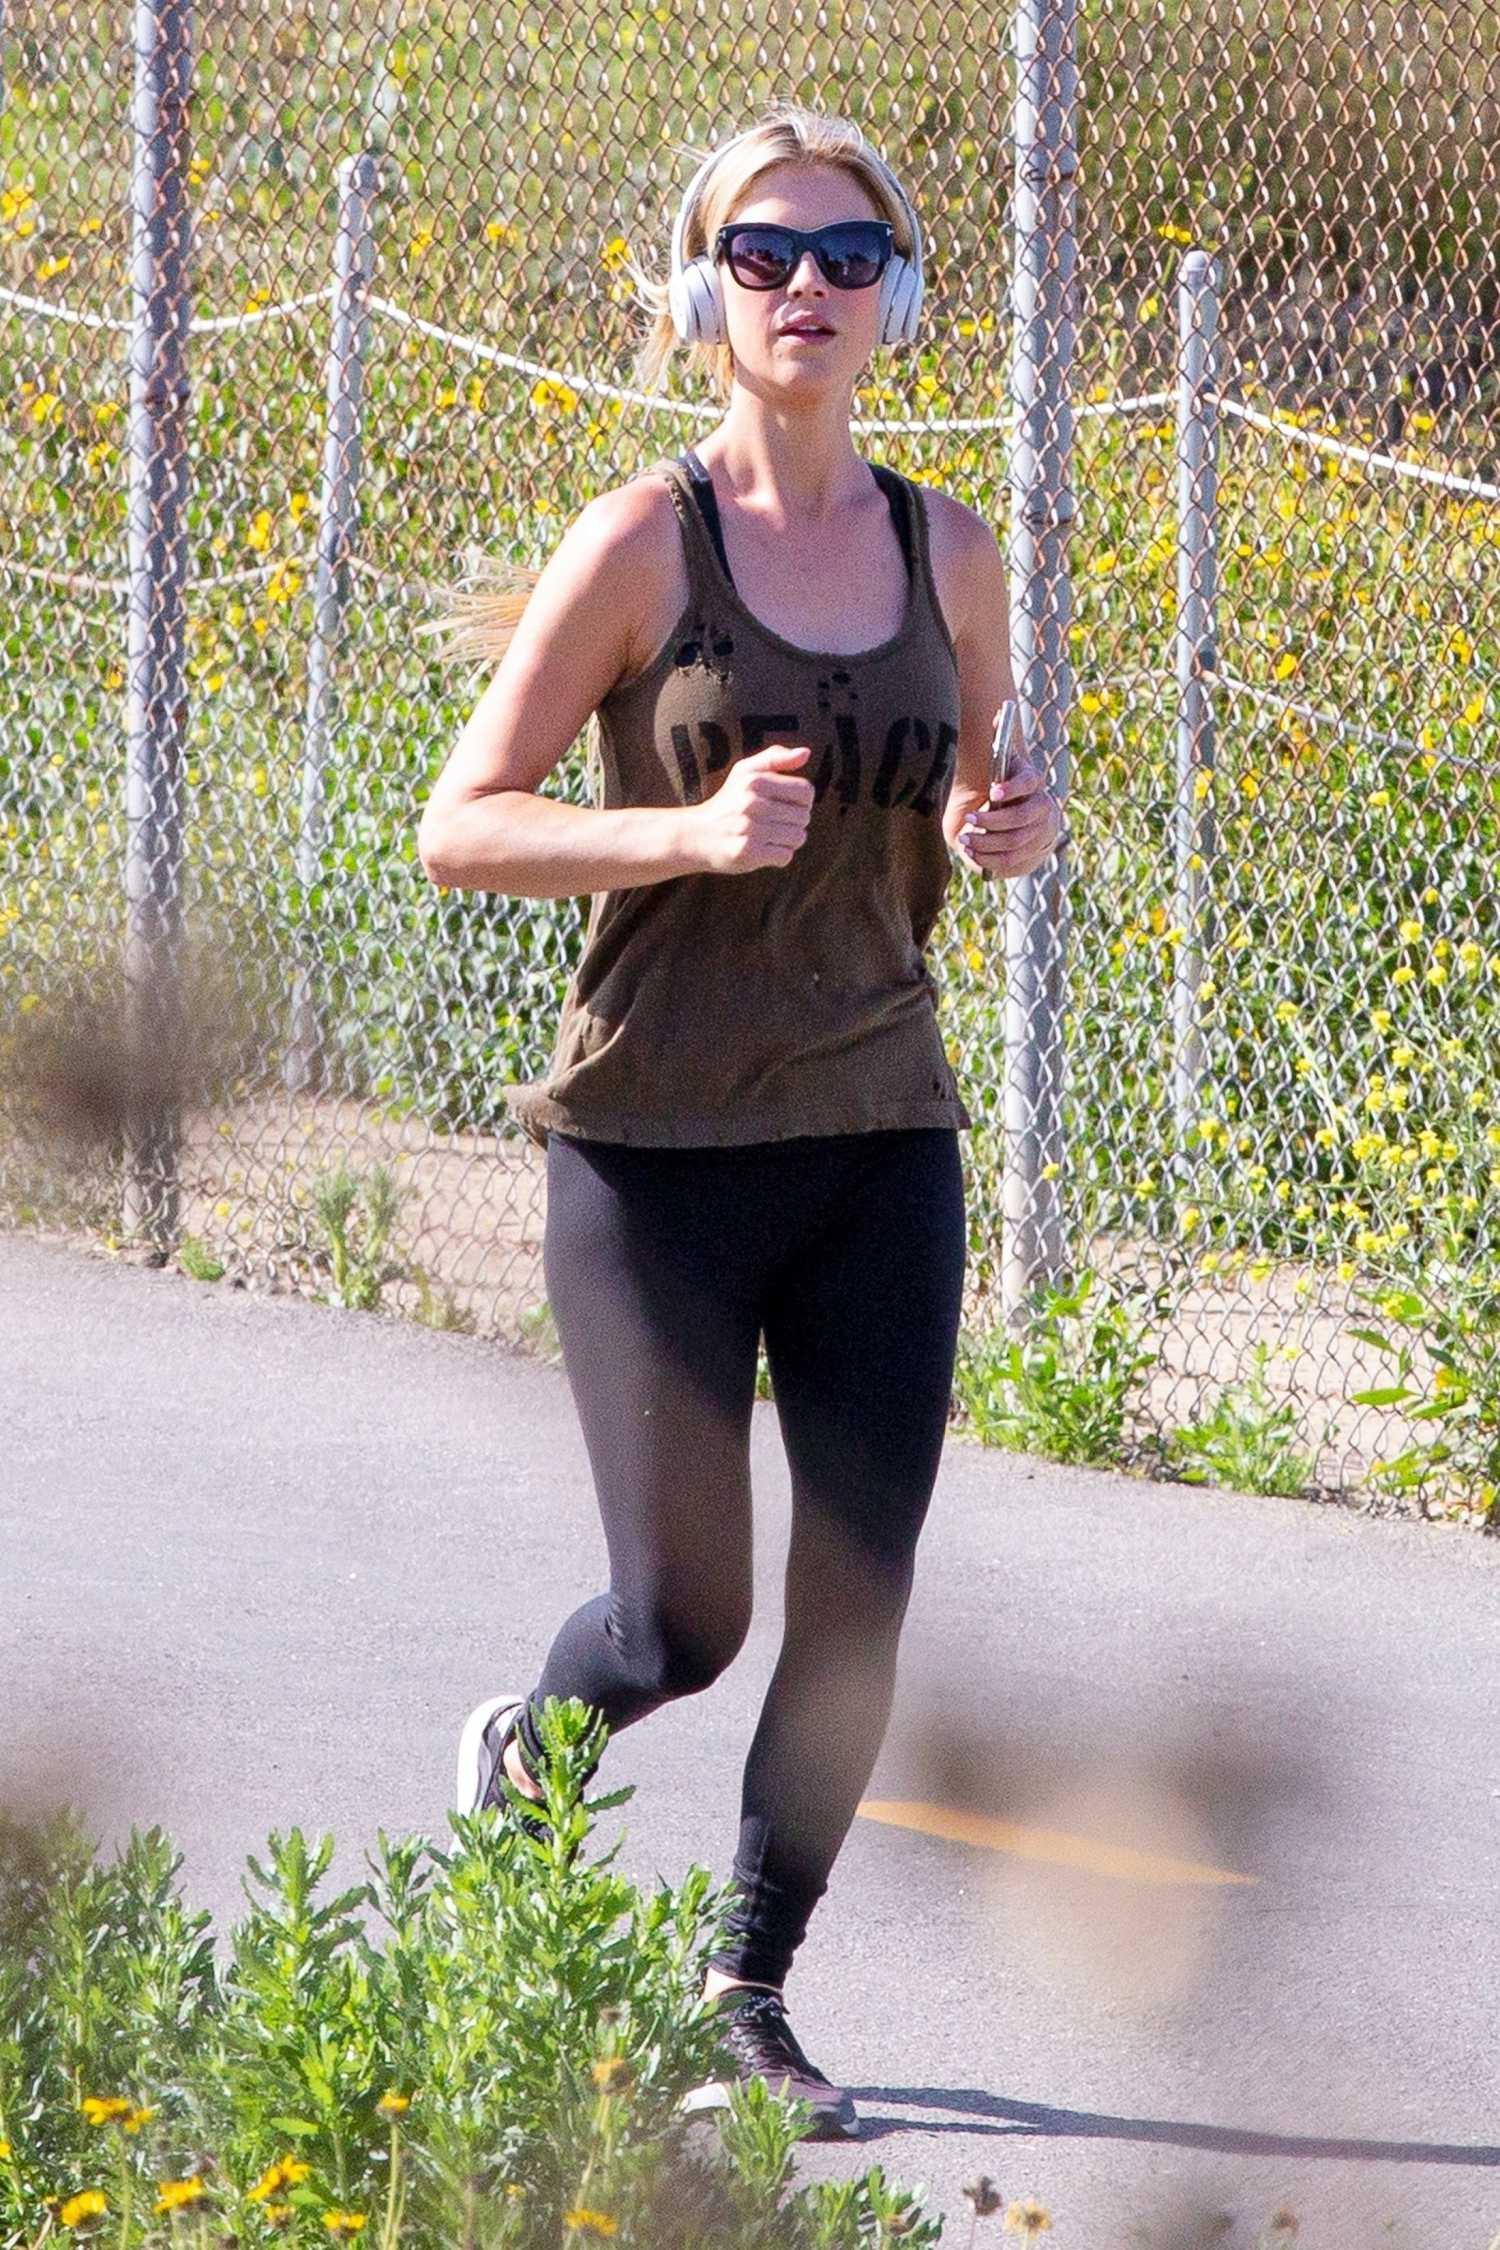 Christina Anstead in a Tan Tank Top Enjoys a Jog in